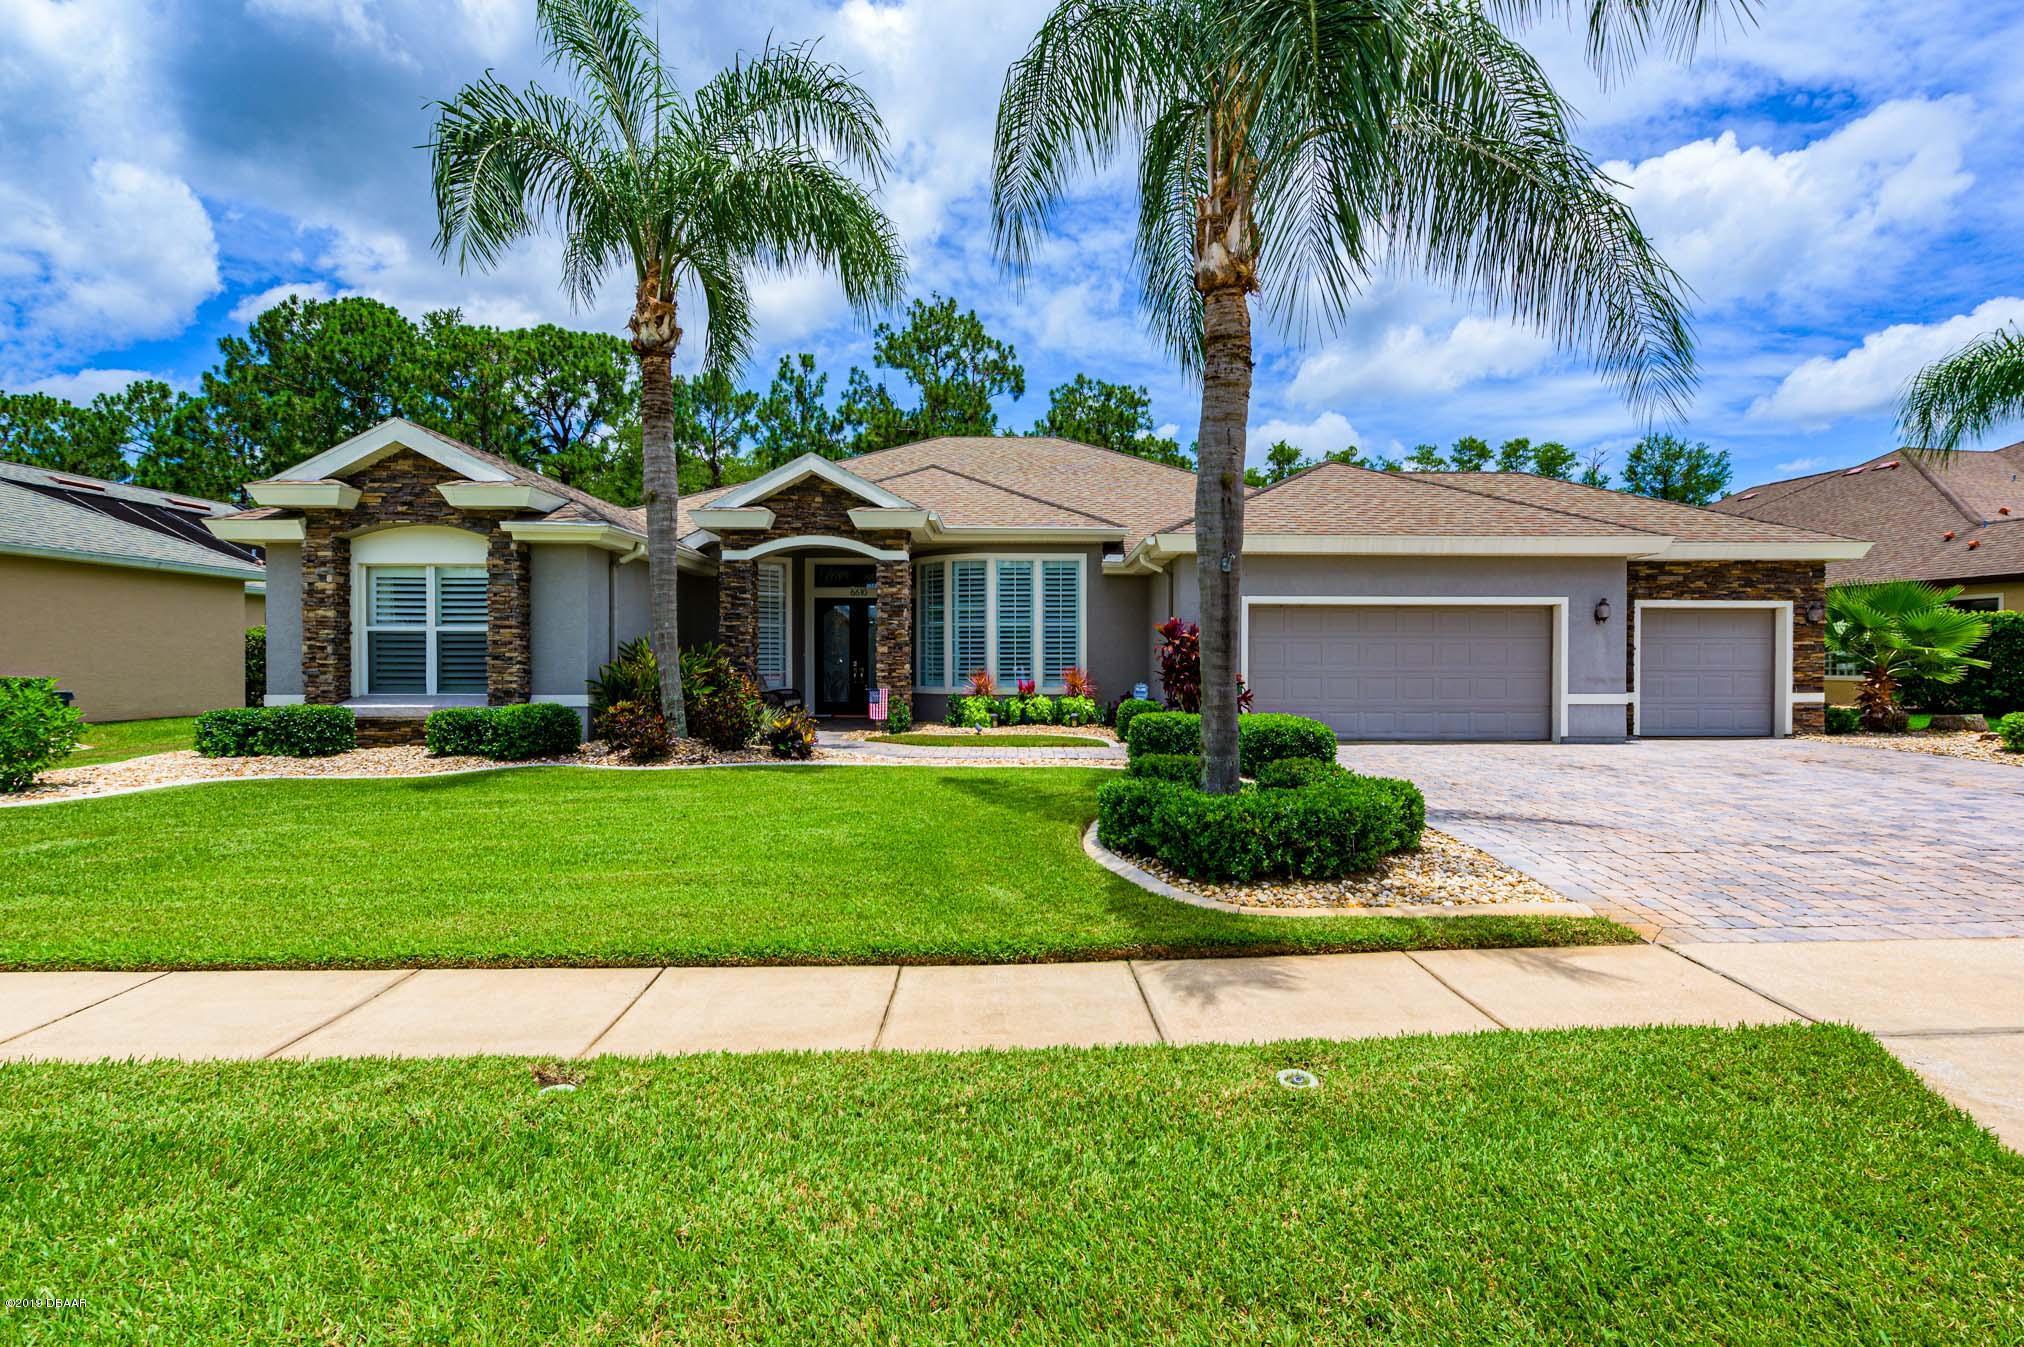 Photo of 6610 Merryvale Lane, Port Orange, FL 32128